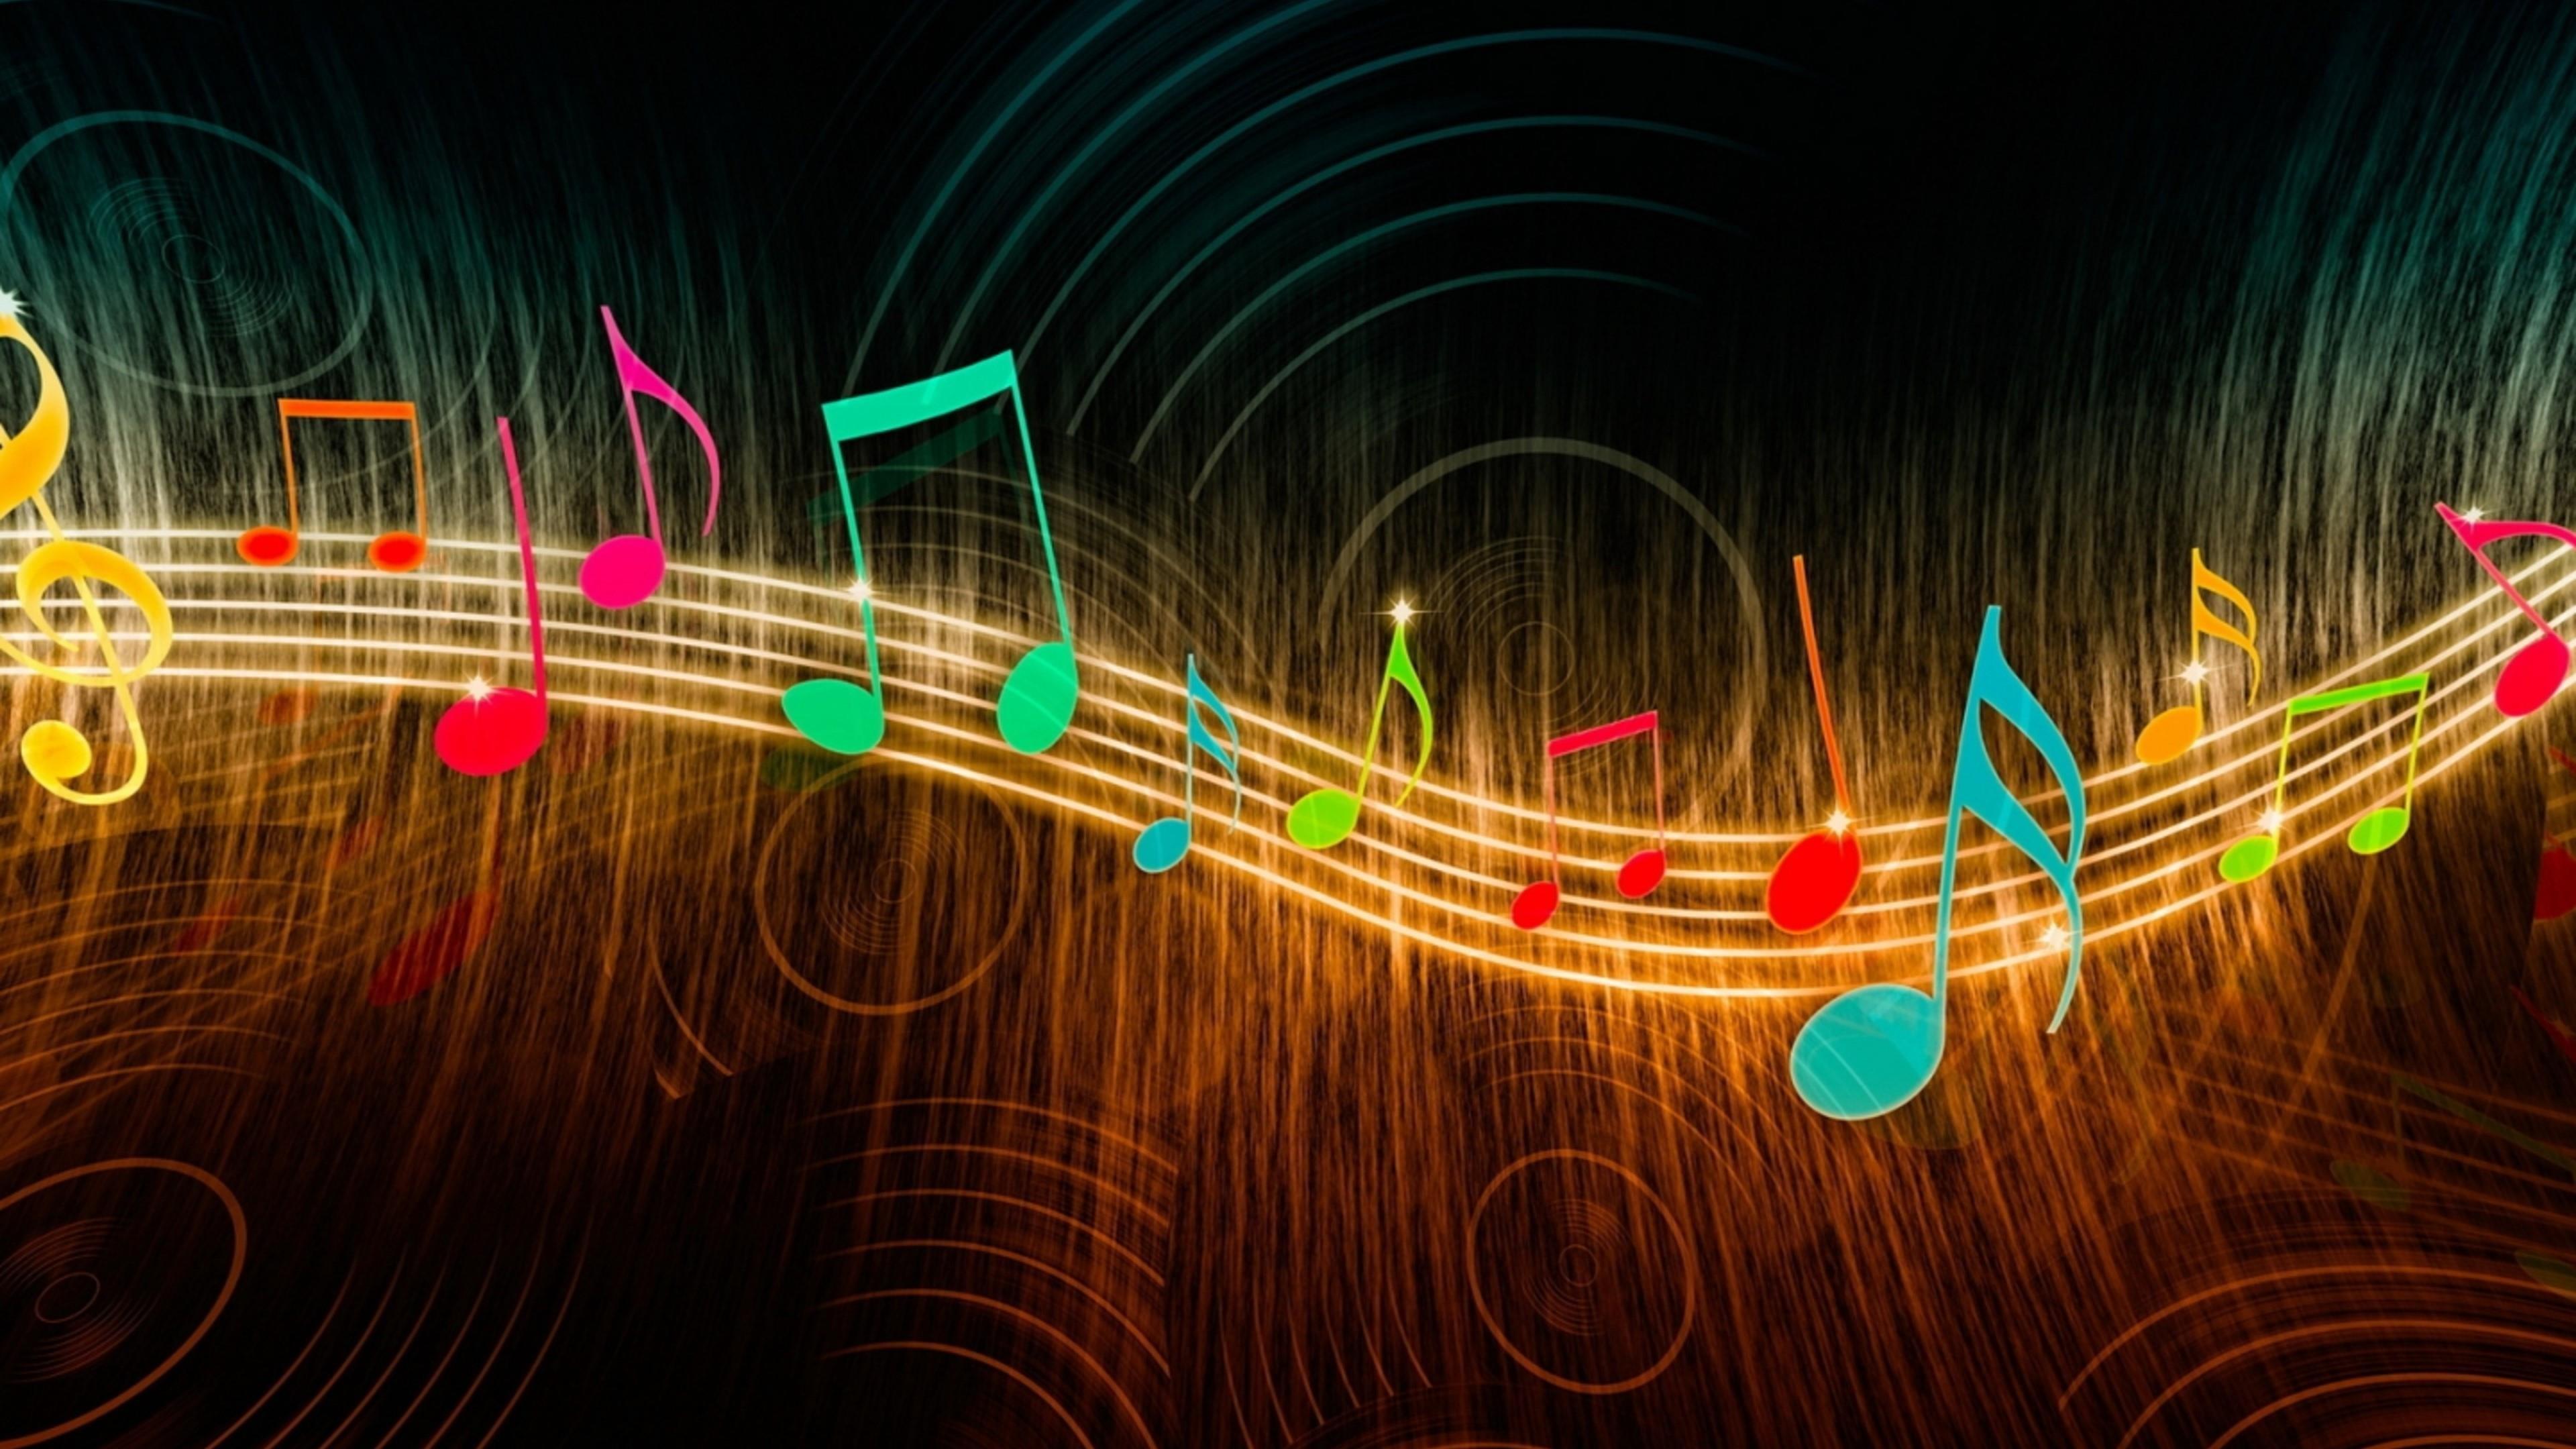 UltraHD wallpaper icon Colorful music note digital art wallpaper